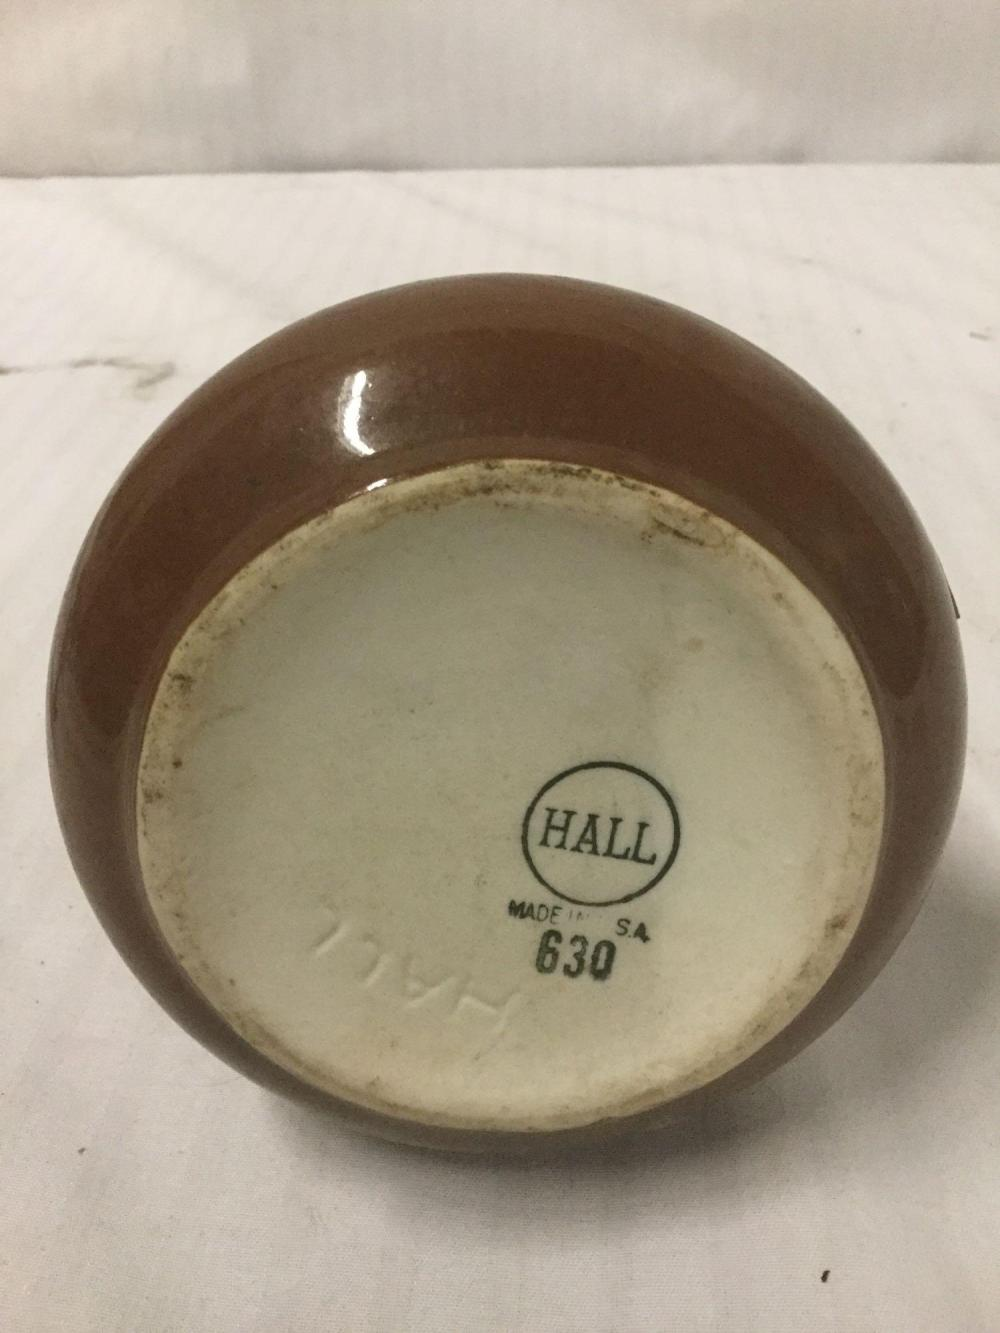 Lot 150: Vintage Hall China Company glazed ceramic vase marked Hall 630 Made in USA